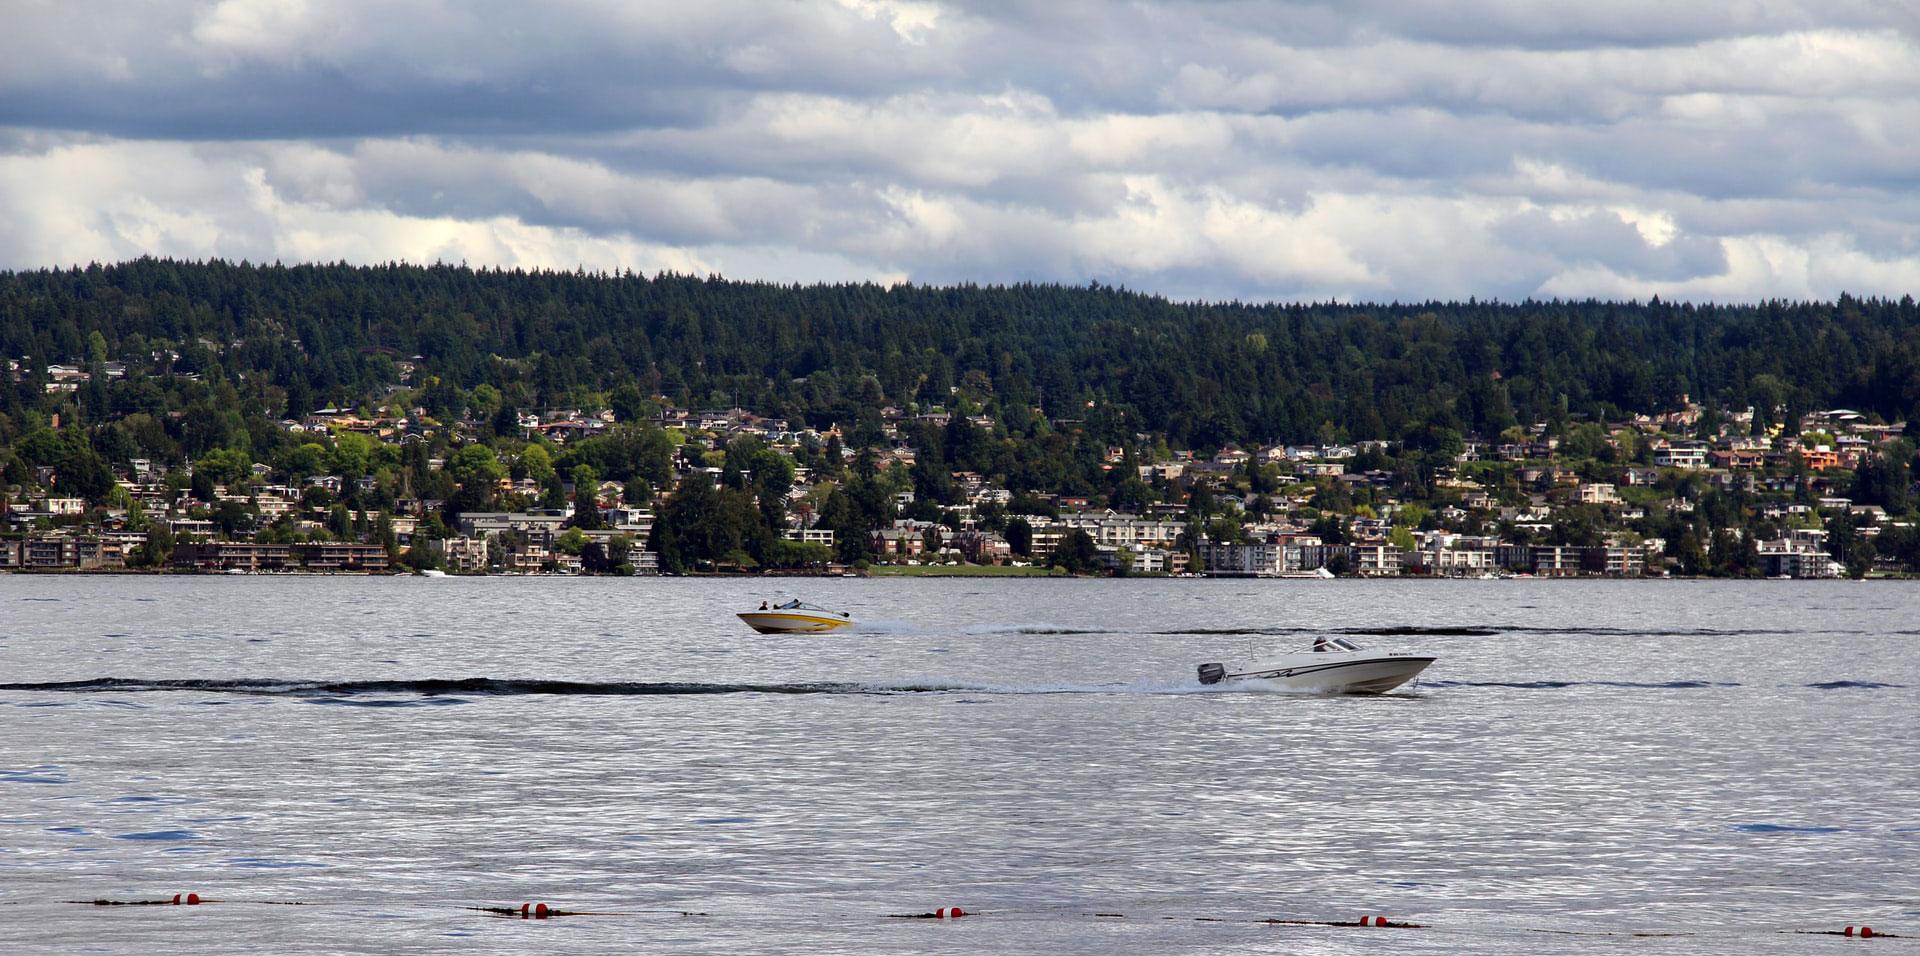 Best Fishing Spots Near Seattle: Lake Washington